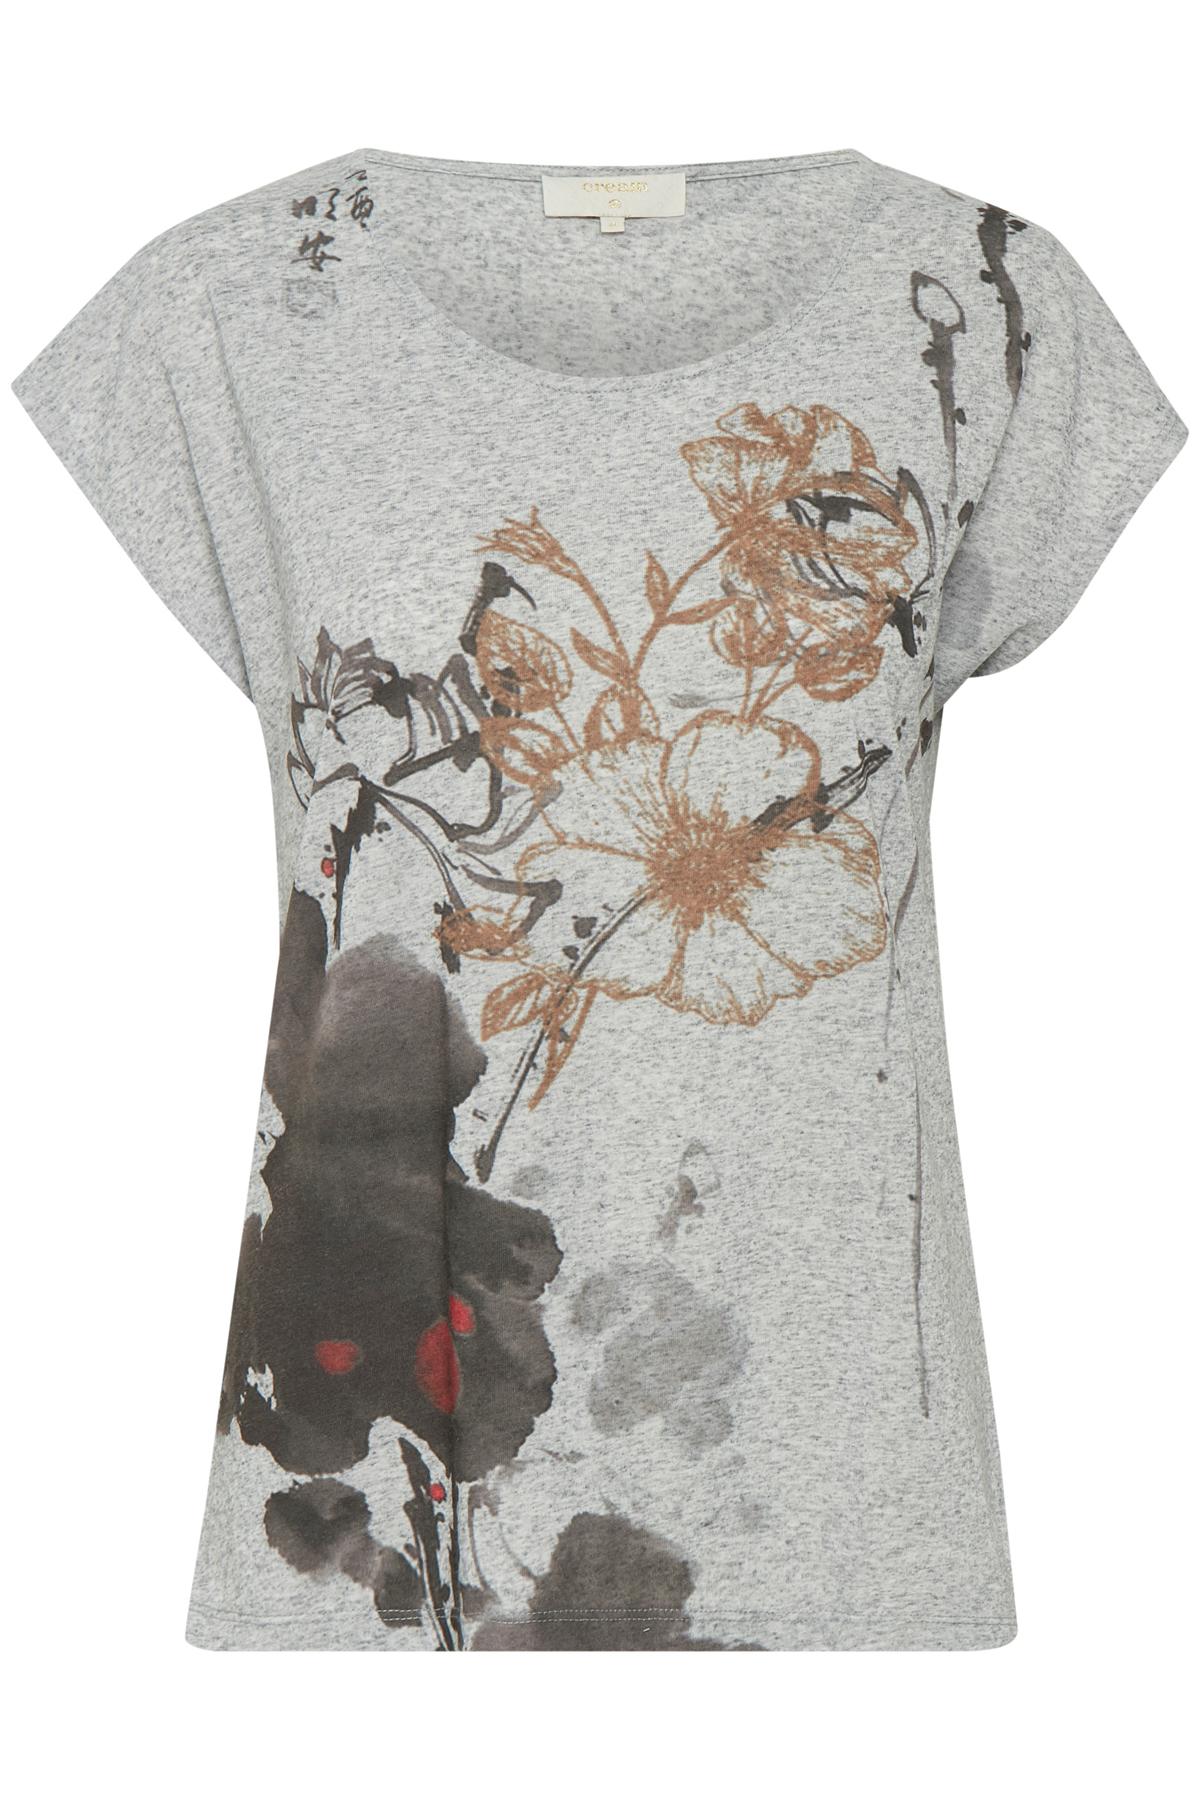 Image of Cream Dame Kortærmet Ally T-shirt - Gråmeleret